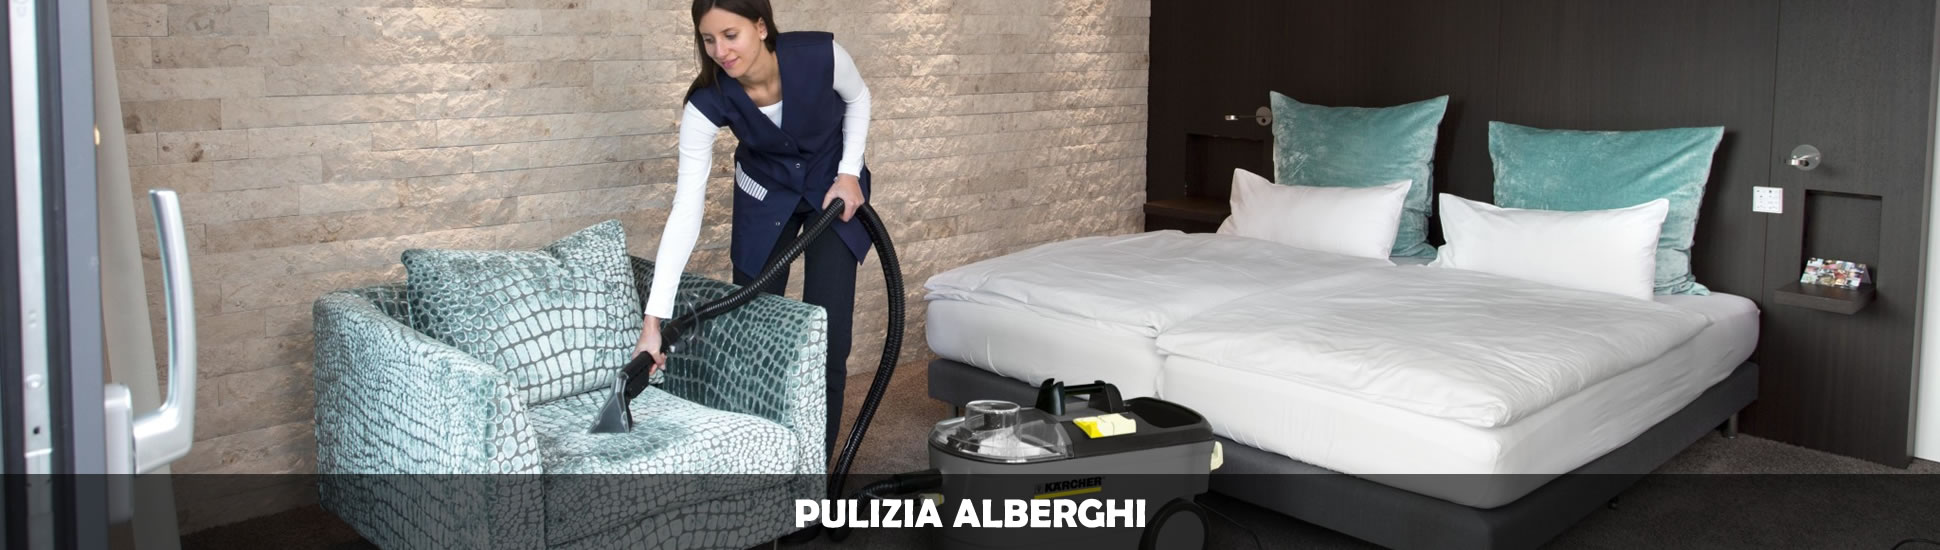 Pulizia alberghi